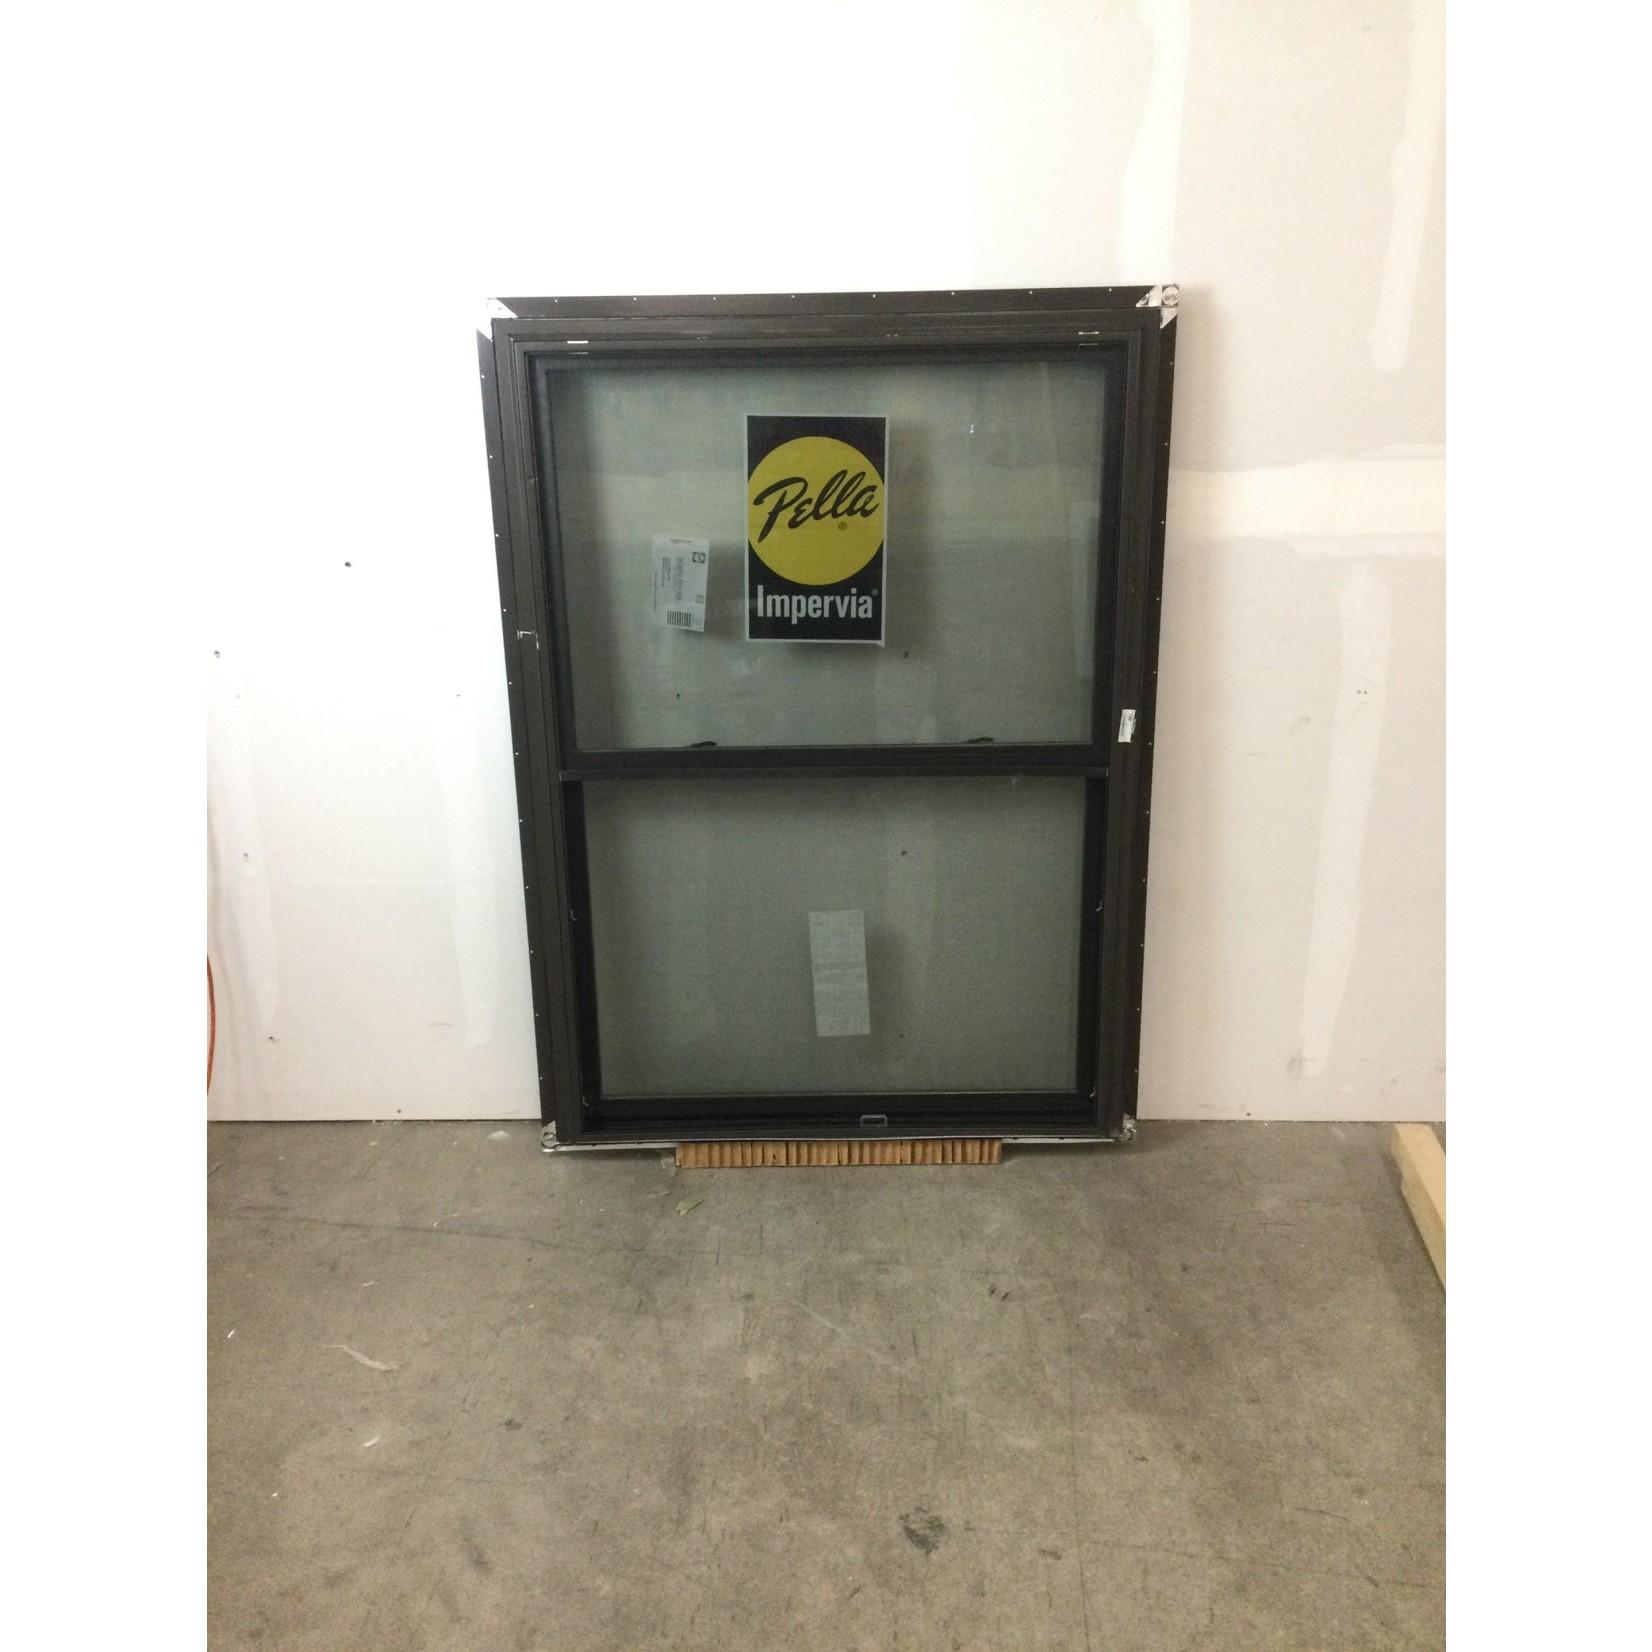 10563 Pella Impervia Double Hung Window